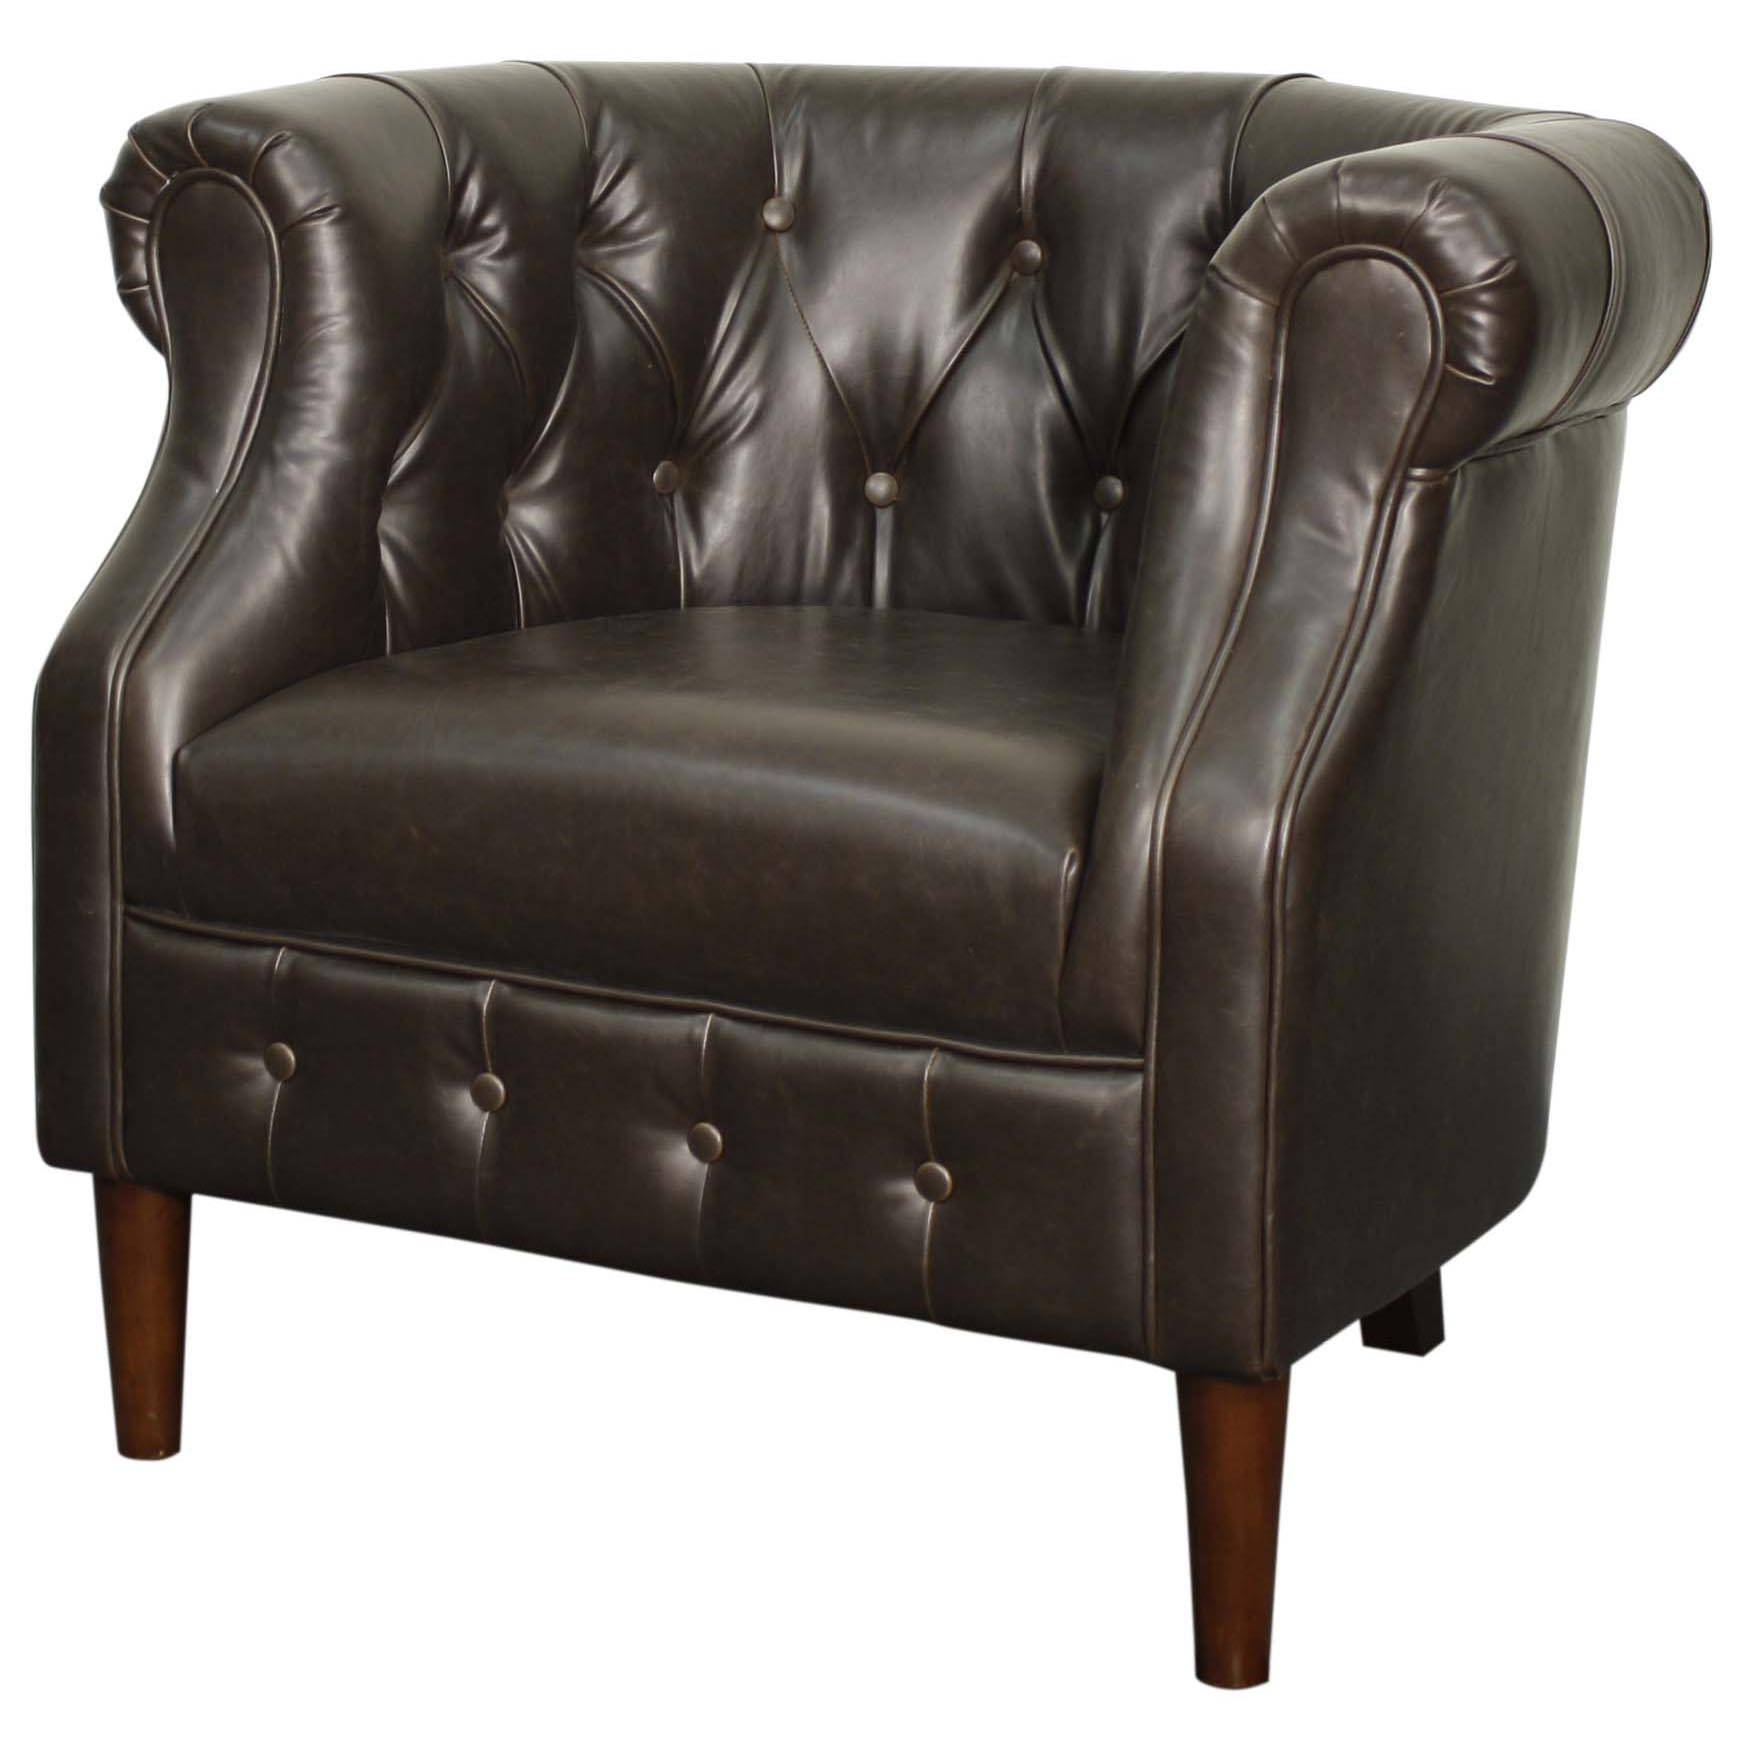 Amazing Luna Bonded Leather Tufted Tub Chair Brown Legs Vintage Dark Brown Creativecarmelina Interior Chair Design Creativecarmelinacom